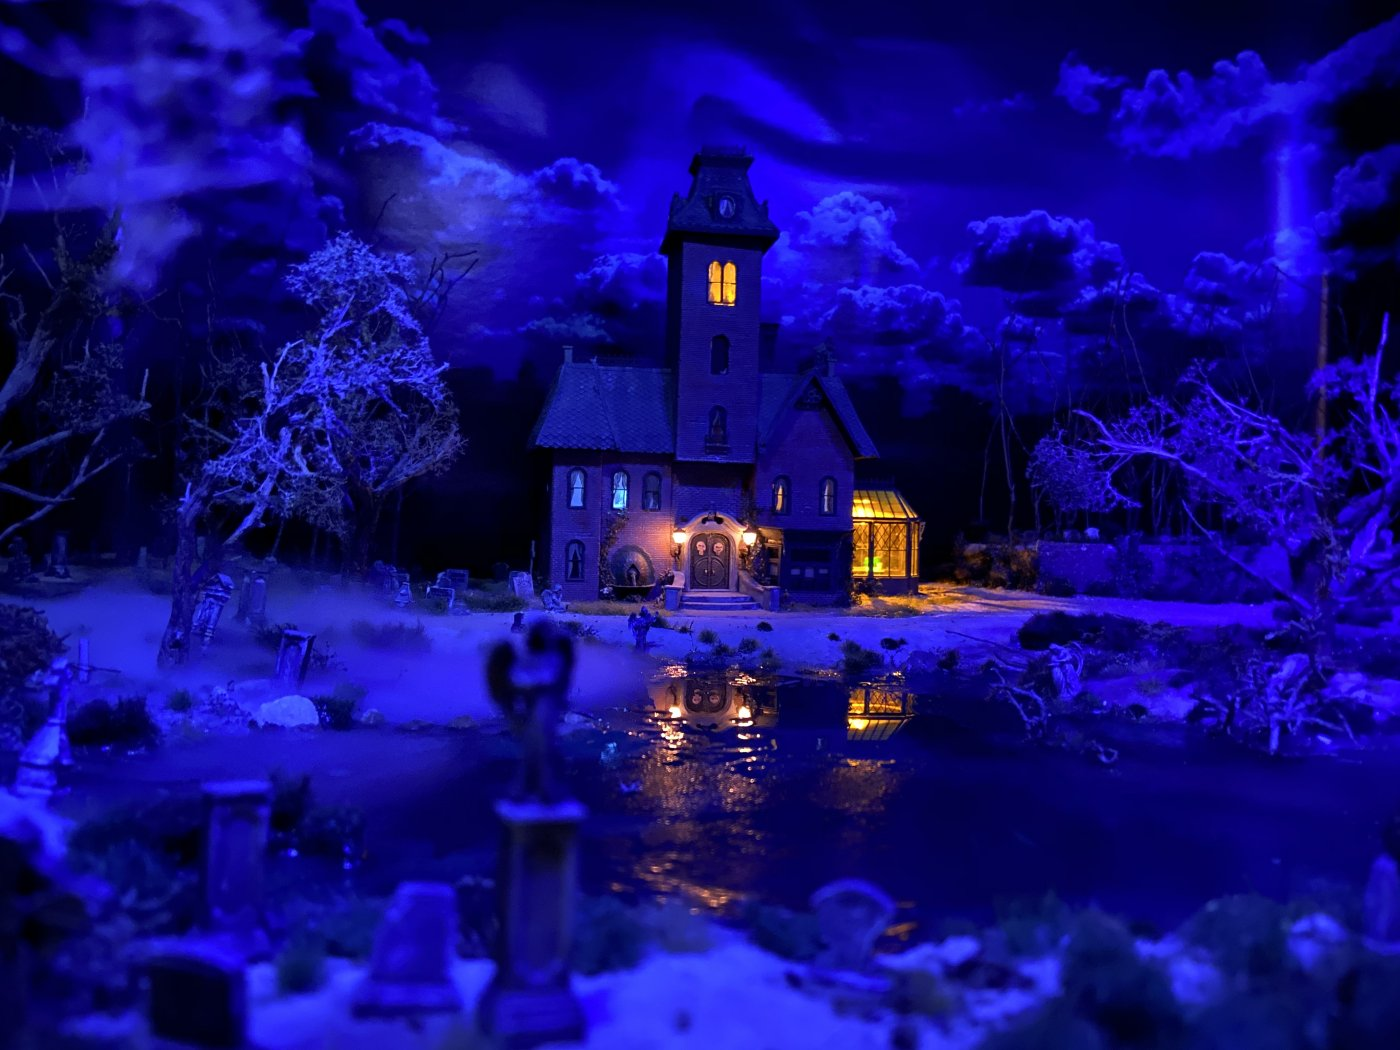 Grimm's Mansion Diorama 2020